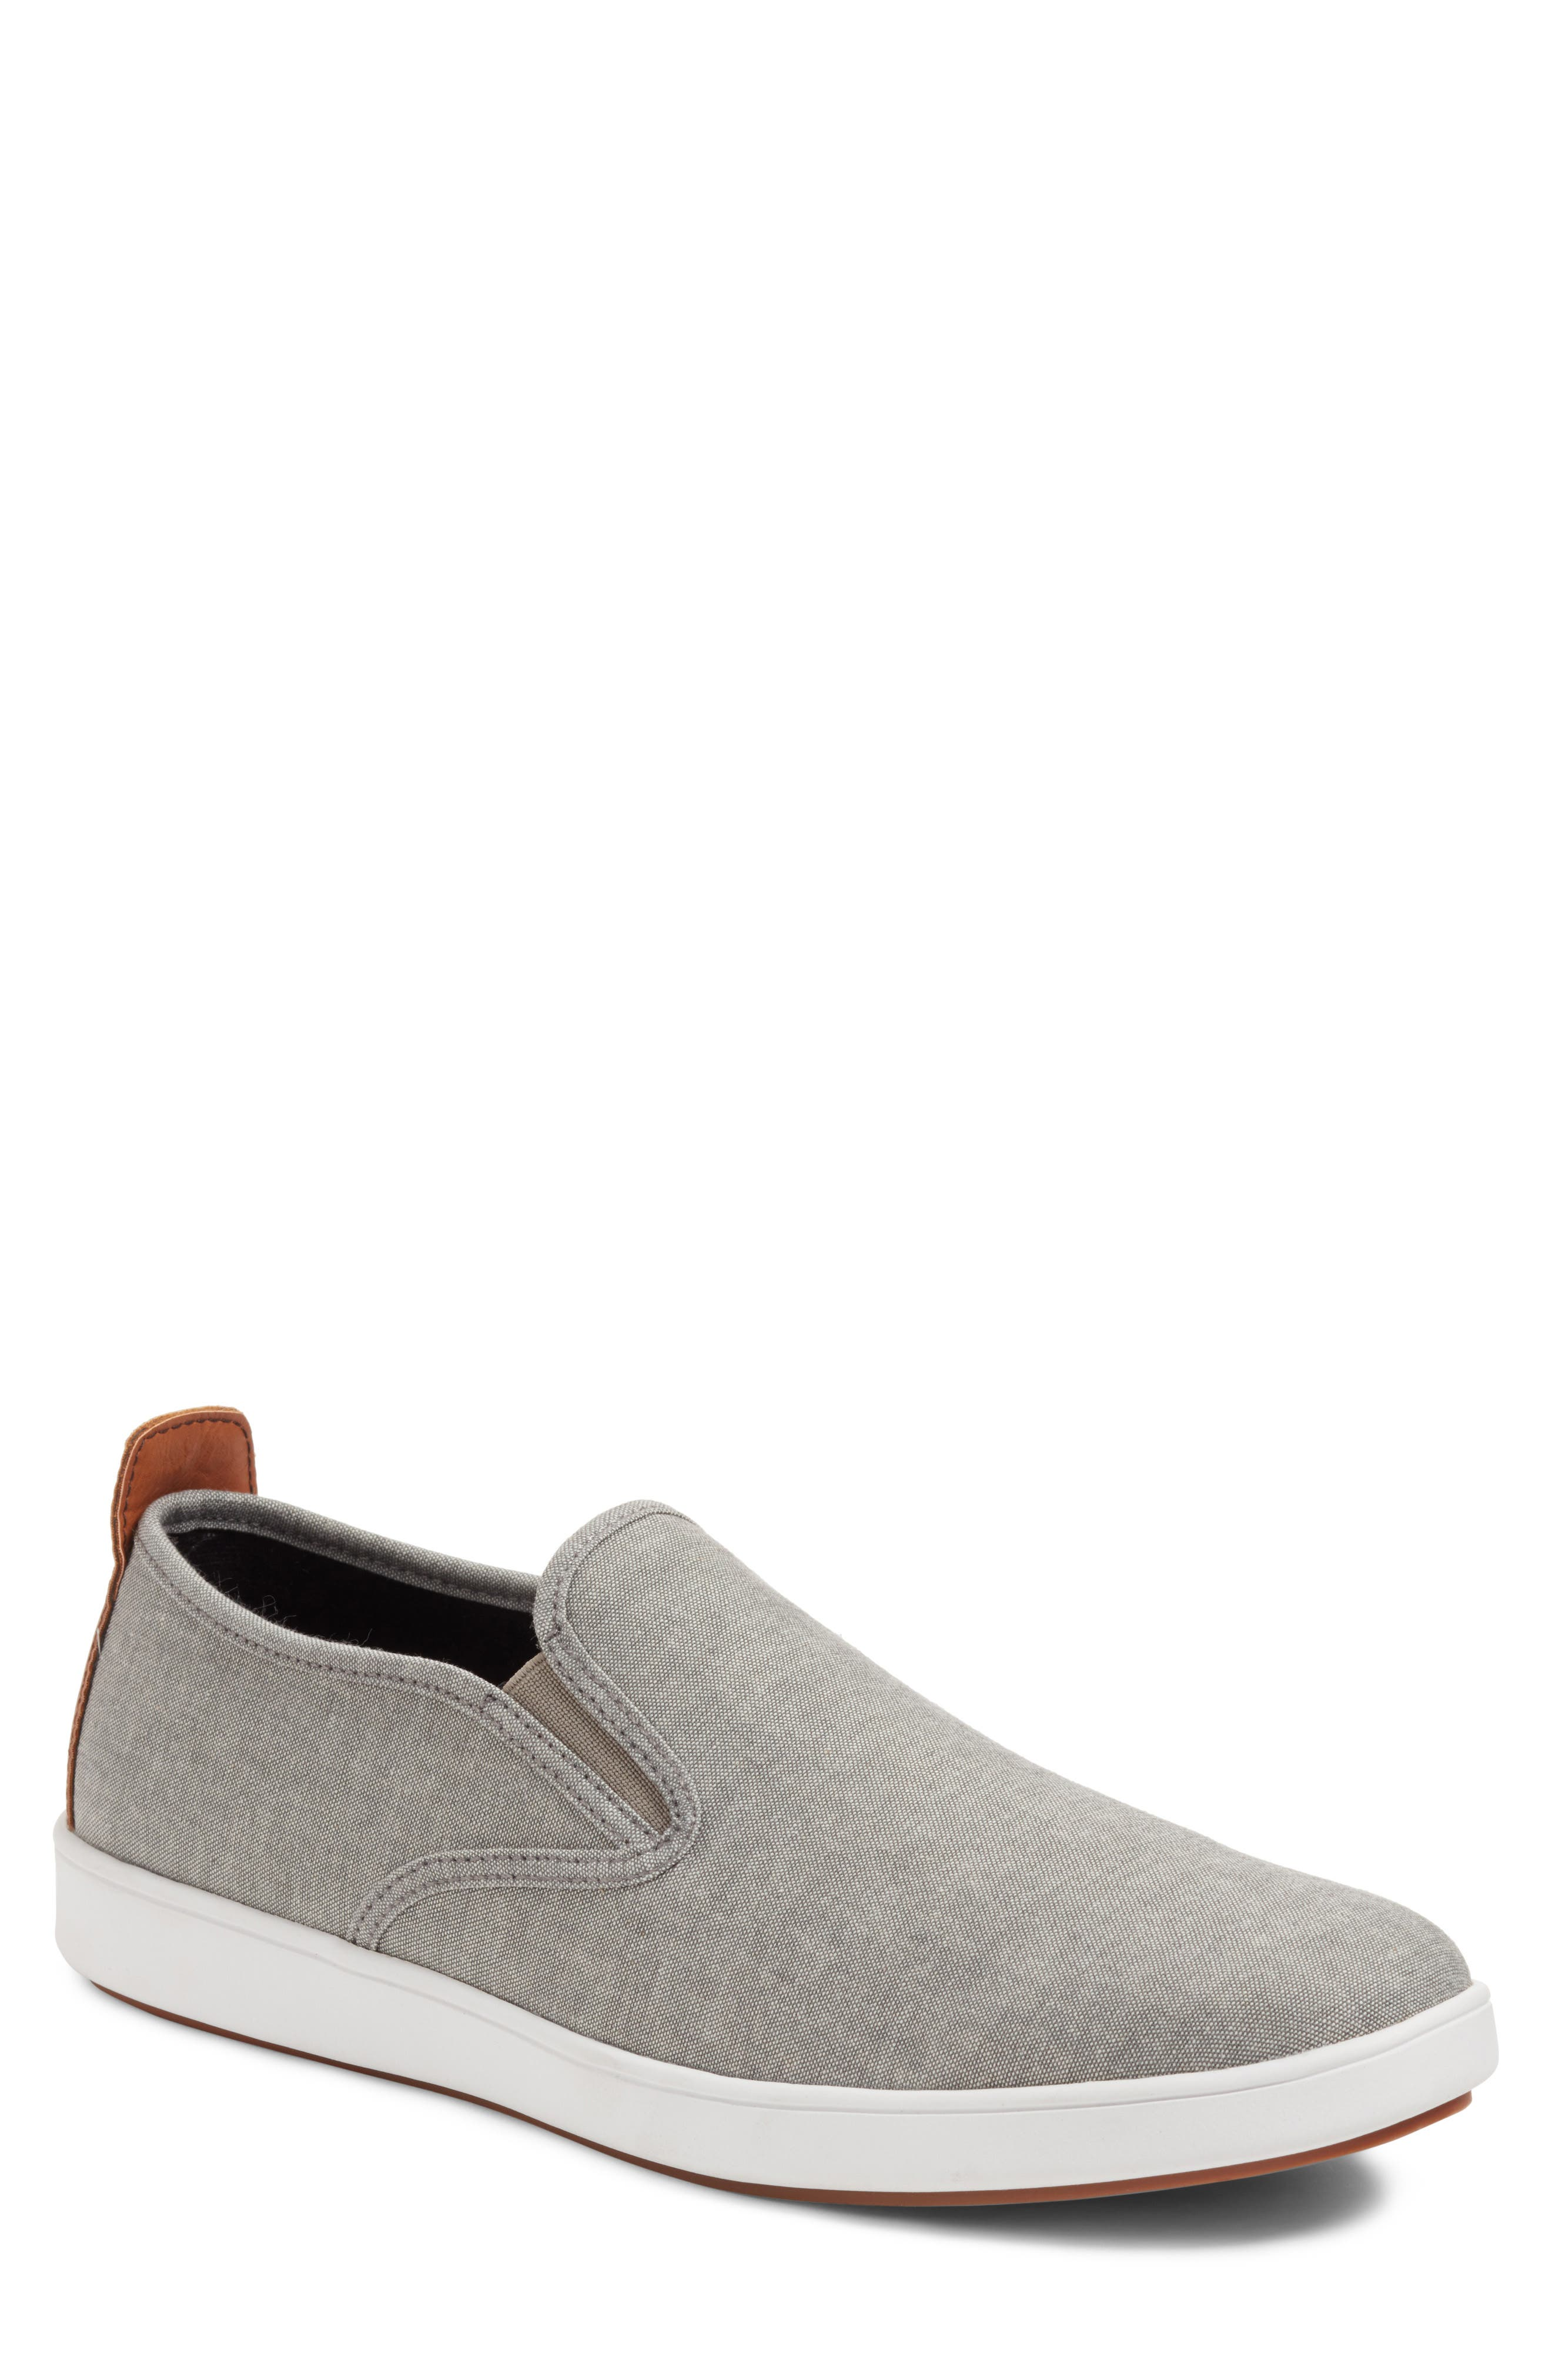 Felix Slip-On Sneaker,                         Main,                         color, Grey